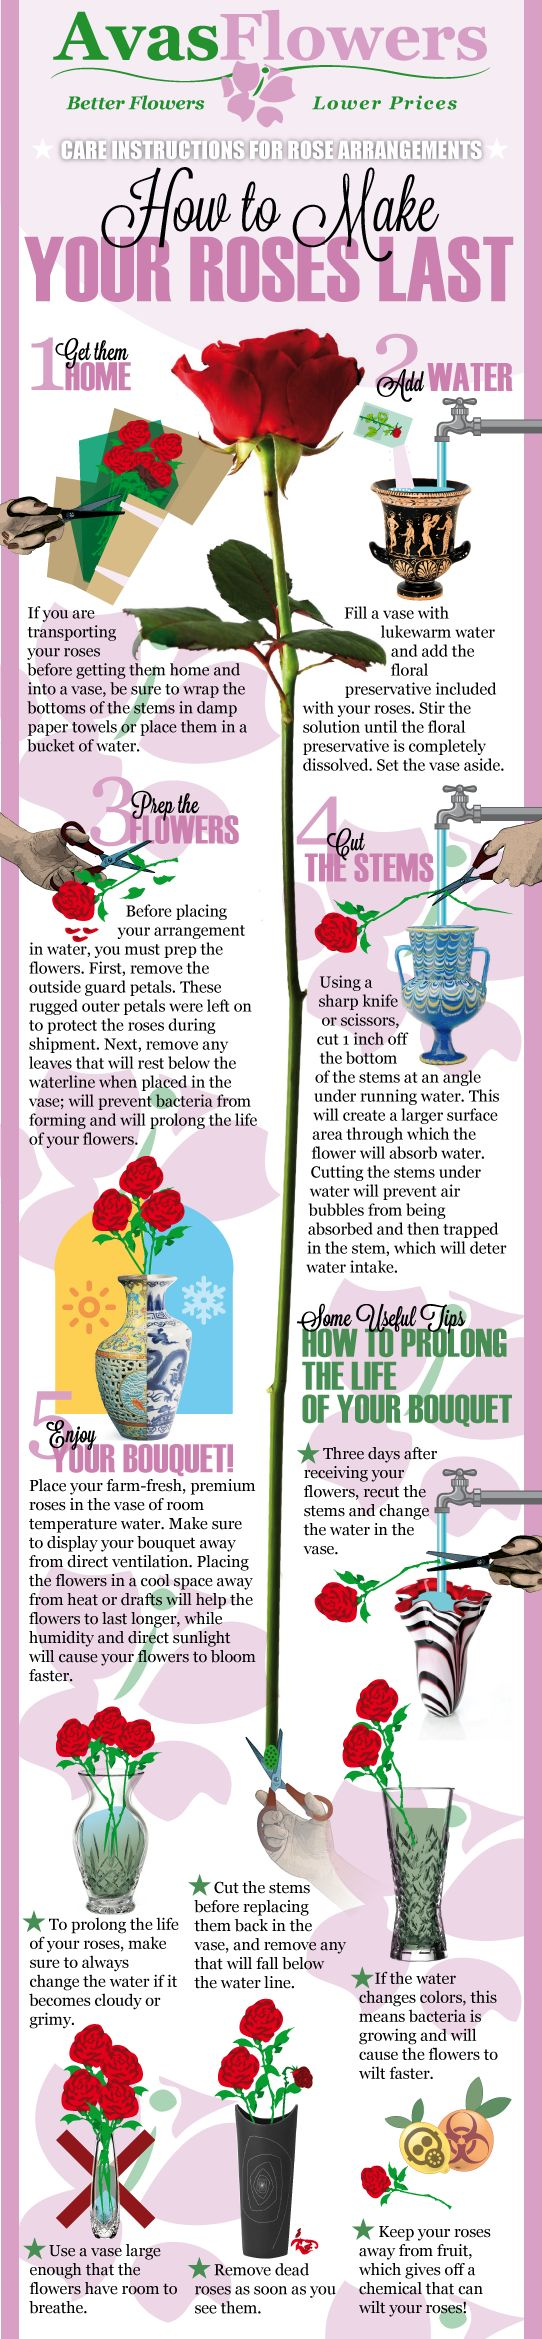 best 25 fresh flower arrangement ideas on pinterest flower arrangements for weddings diy. Black Bedroom Furniture Sets. Home Design Ideas